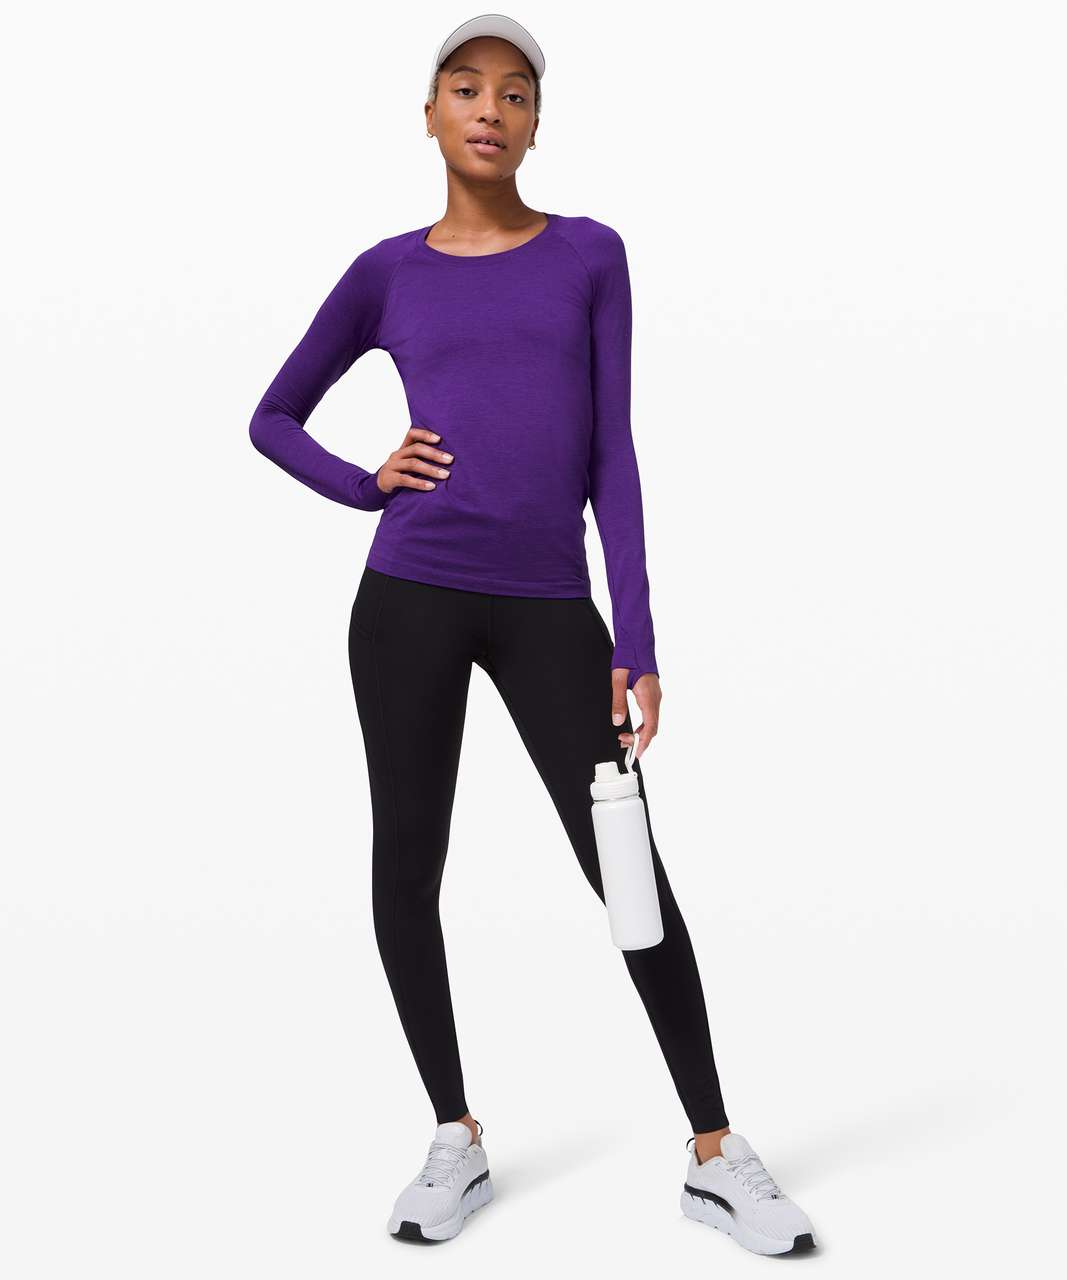 Lululemon Swiftly Tech Long Sleeve 2.0 - Court Purple / Court Purple